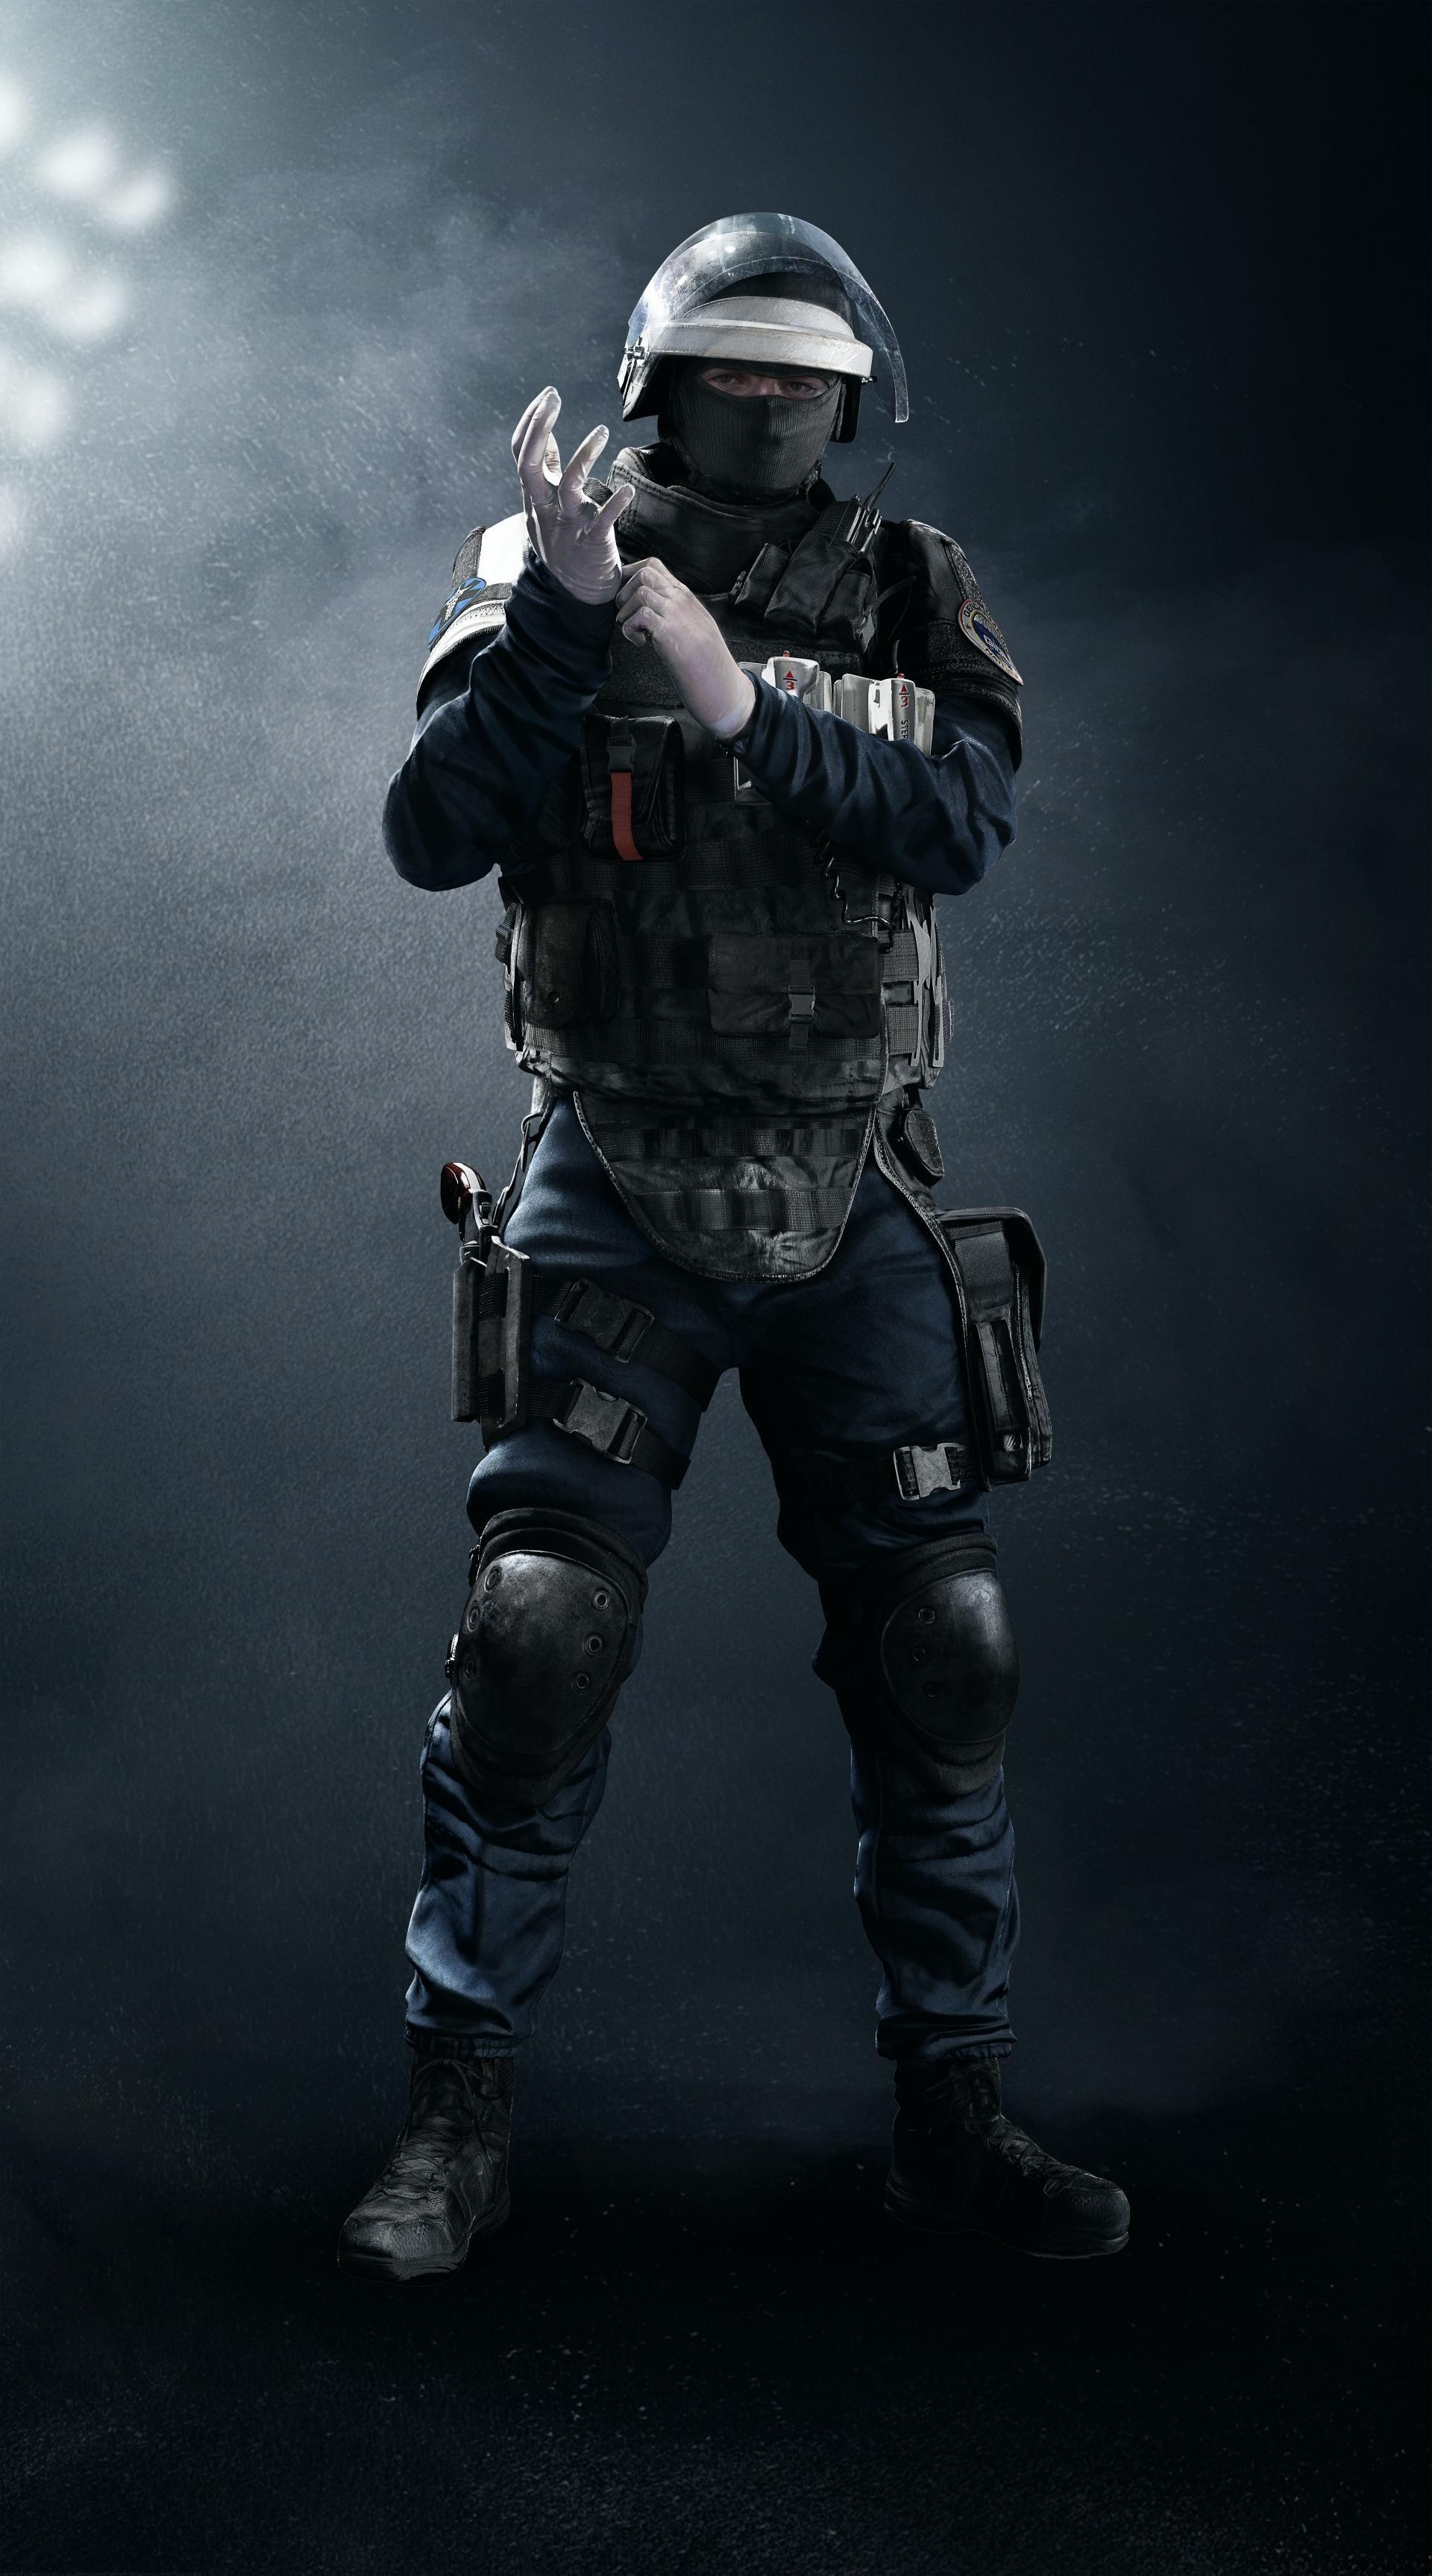 Doc. GIGN. Base Game Operator. Special MPD0 Stim Pistol